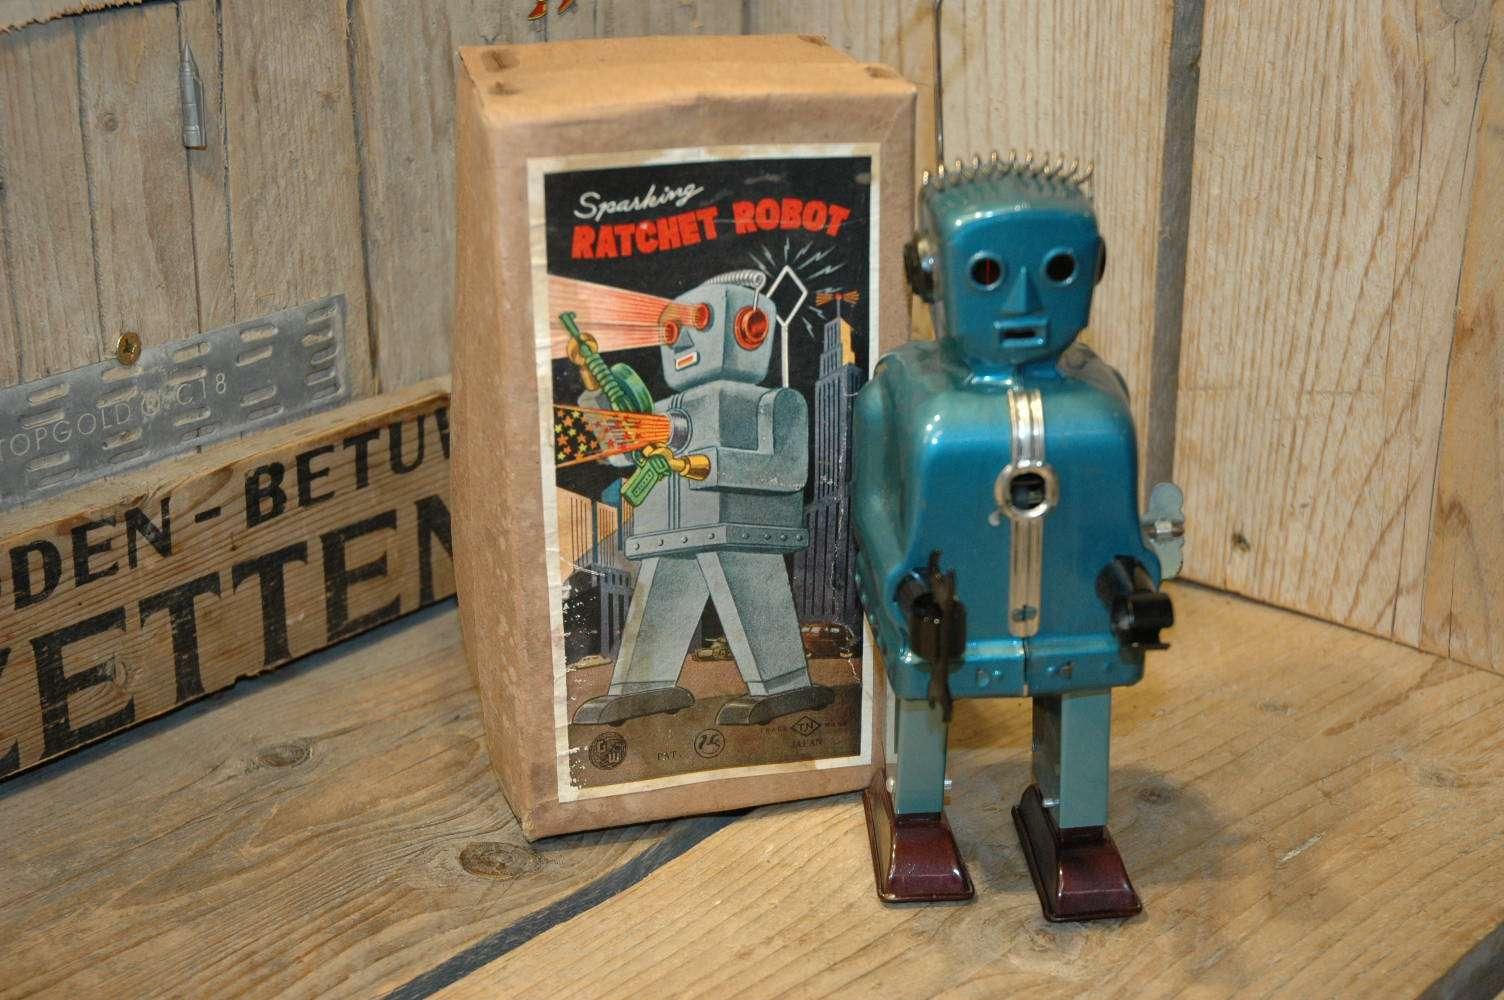 Nomura - Sparking Ratchet Robot